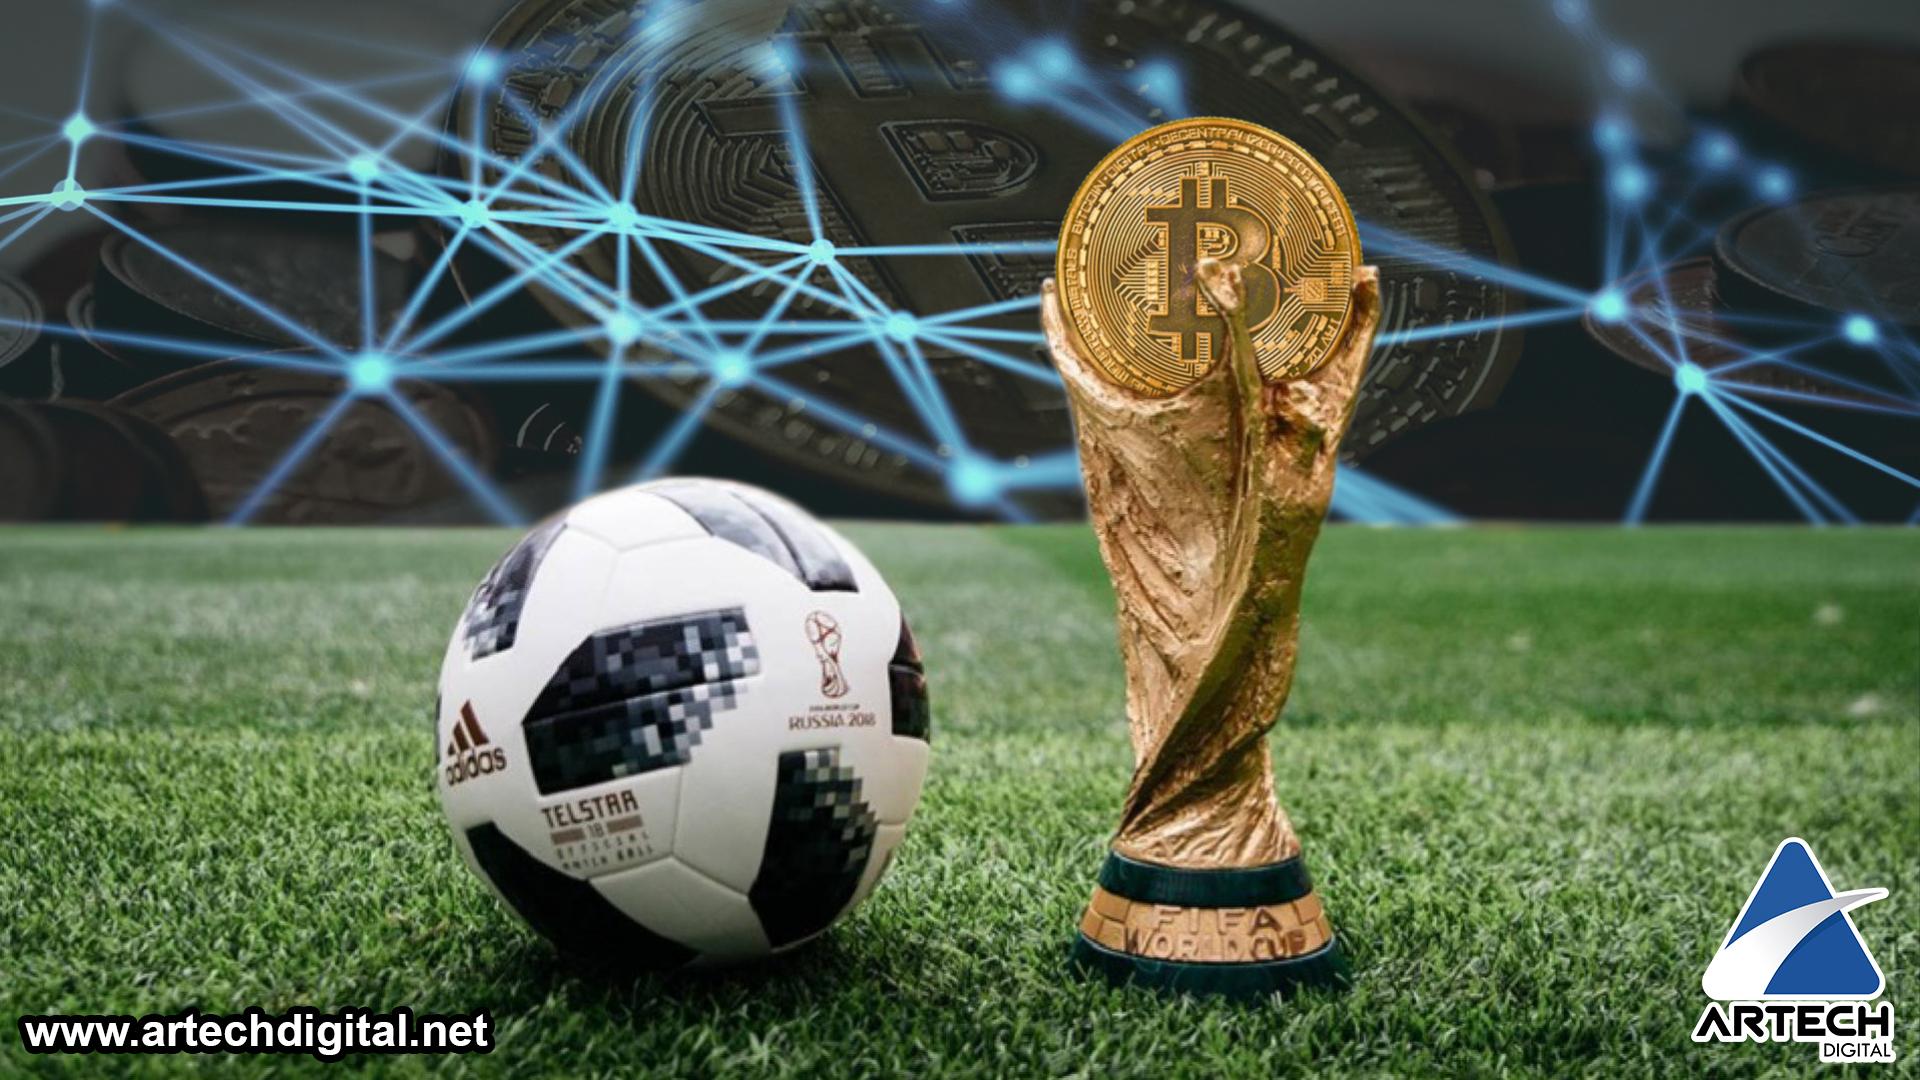 Mundial 2018 - Criptomonedas - Artech Digital